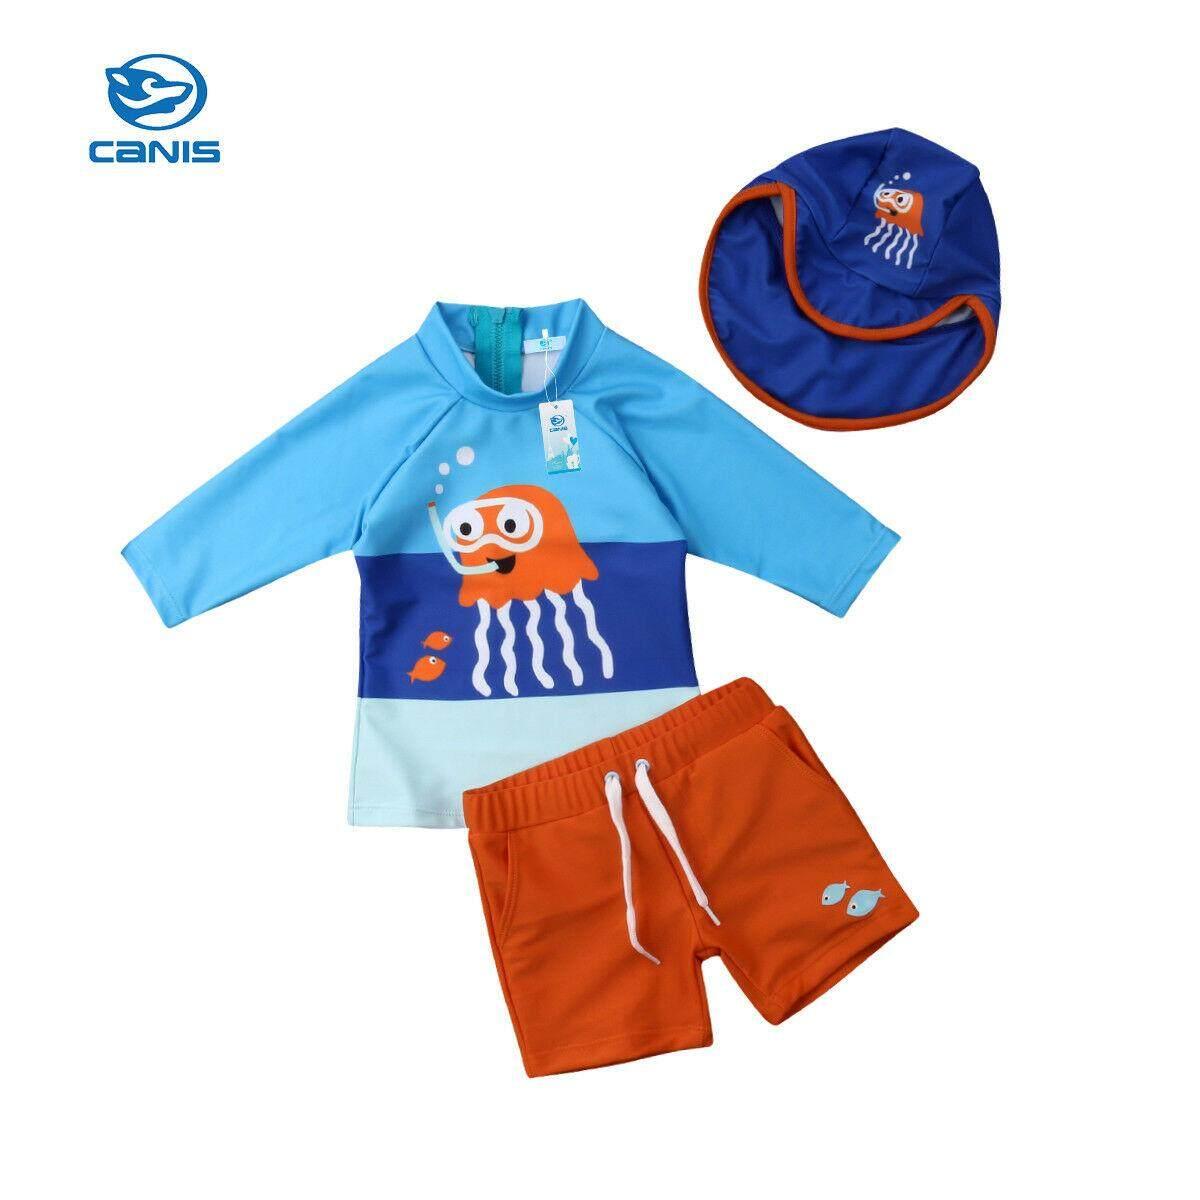 c7420ca69 Toddler Kids Baby Boys Bikini Set Swimwear Swimsuit Bathing Surfing Suit UV  50+